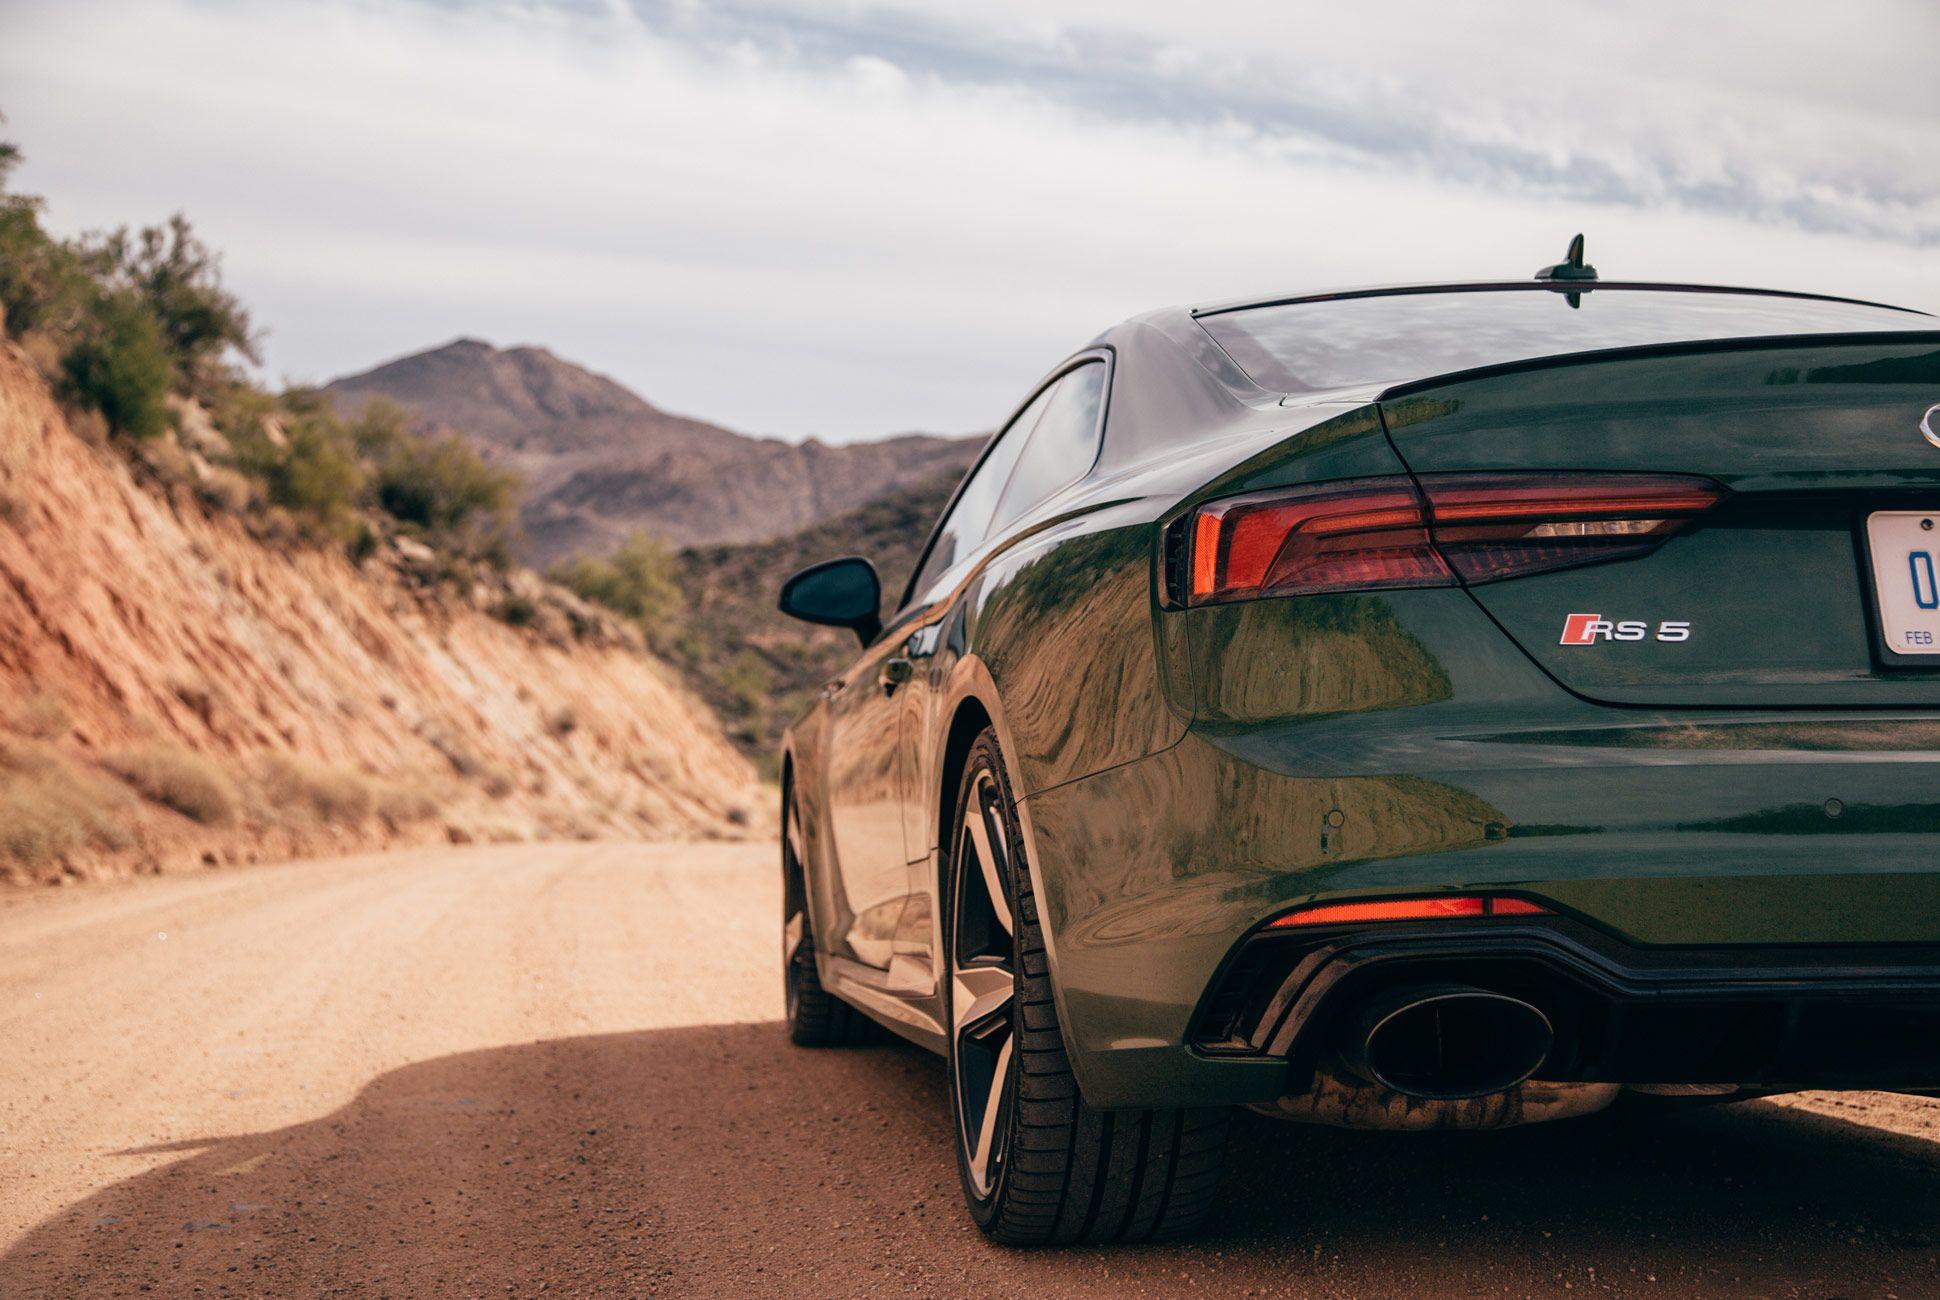 Audi-RS5-Gear-Patrol-Slide-6